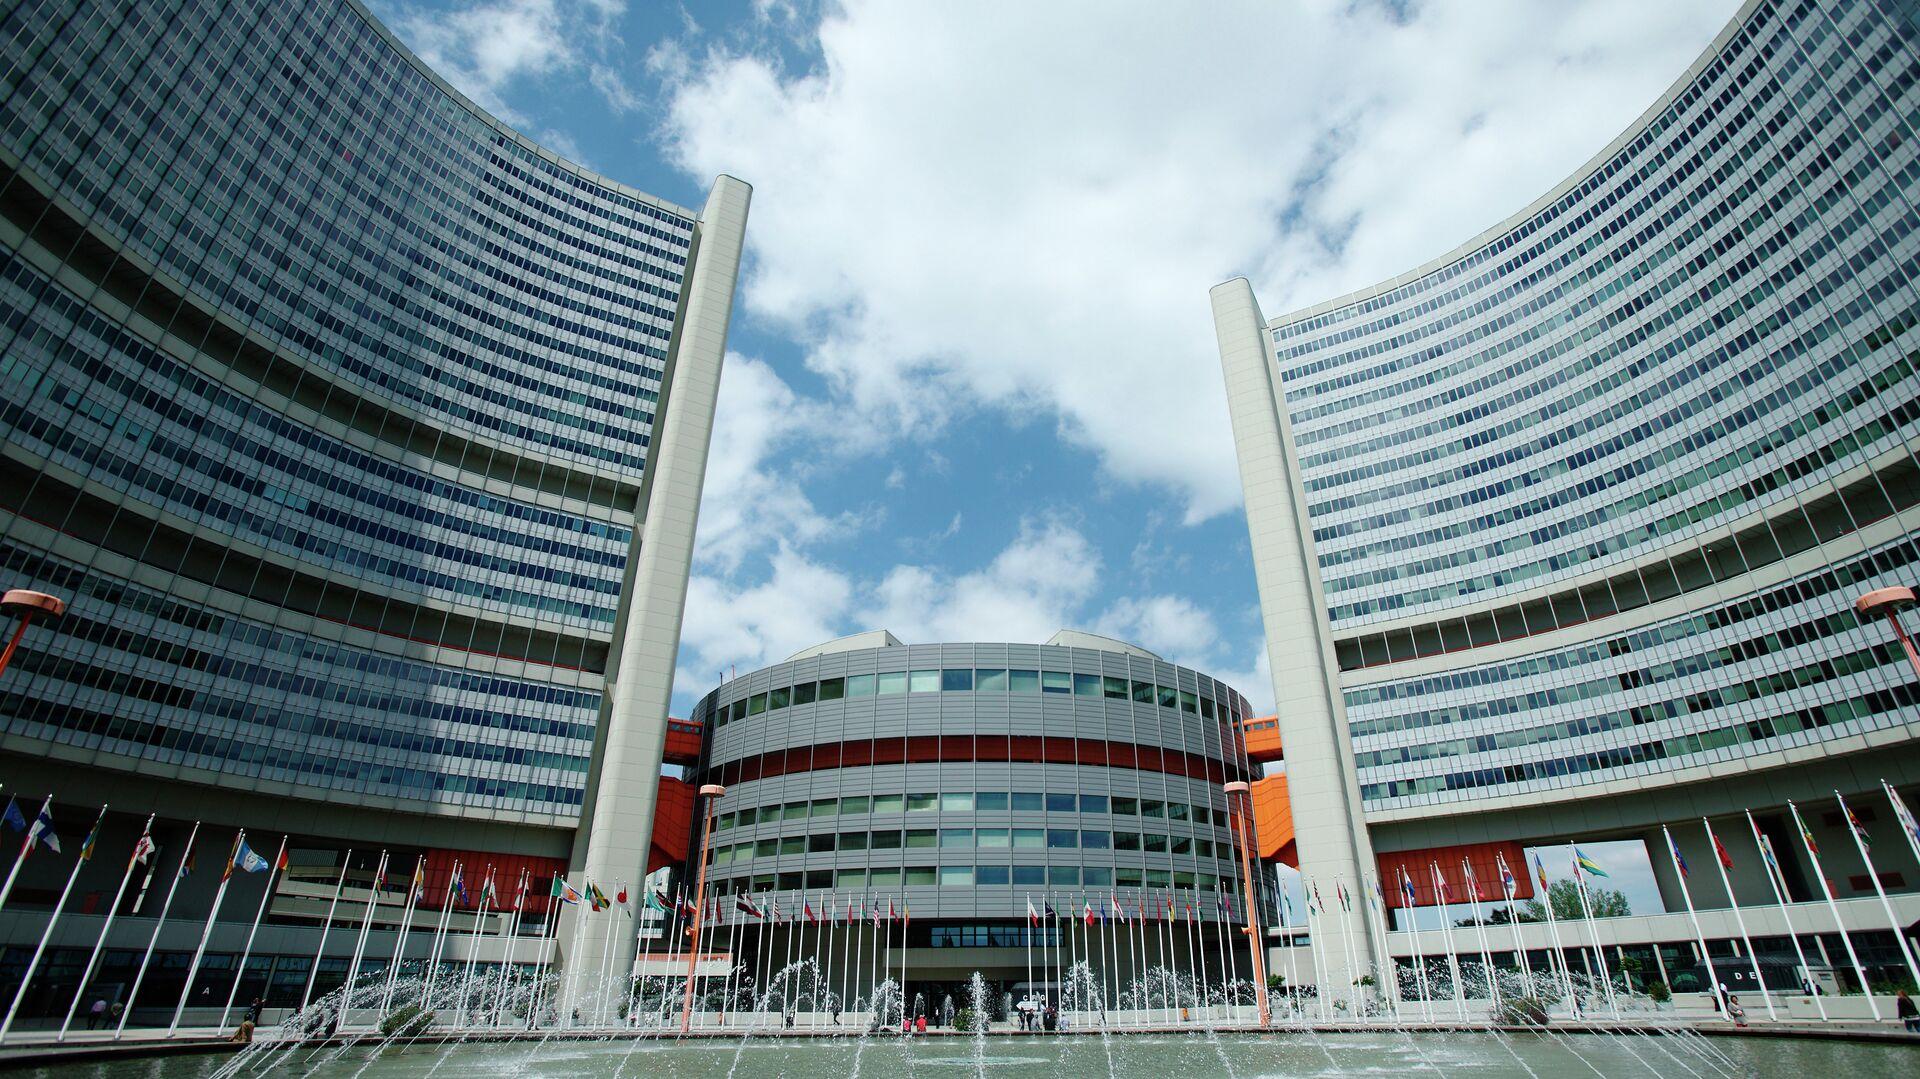 Centro Internacional de Viena, sede de la Agencia Internacional de Energía Atómica (OIEA) - Sputnik Mundo, 1920, 27.06.2021